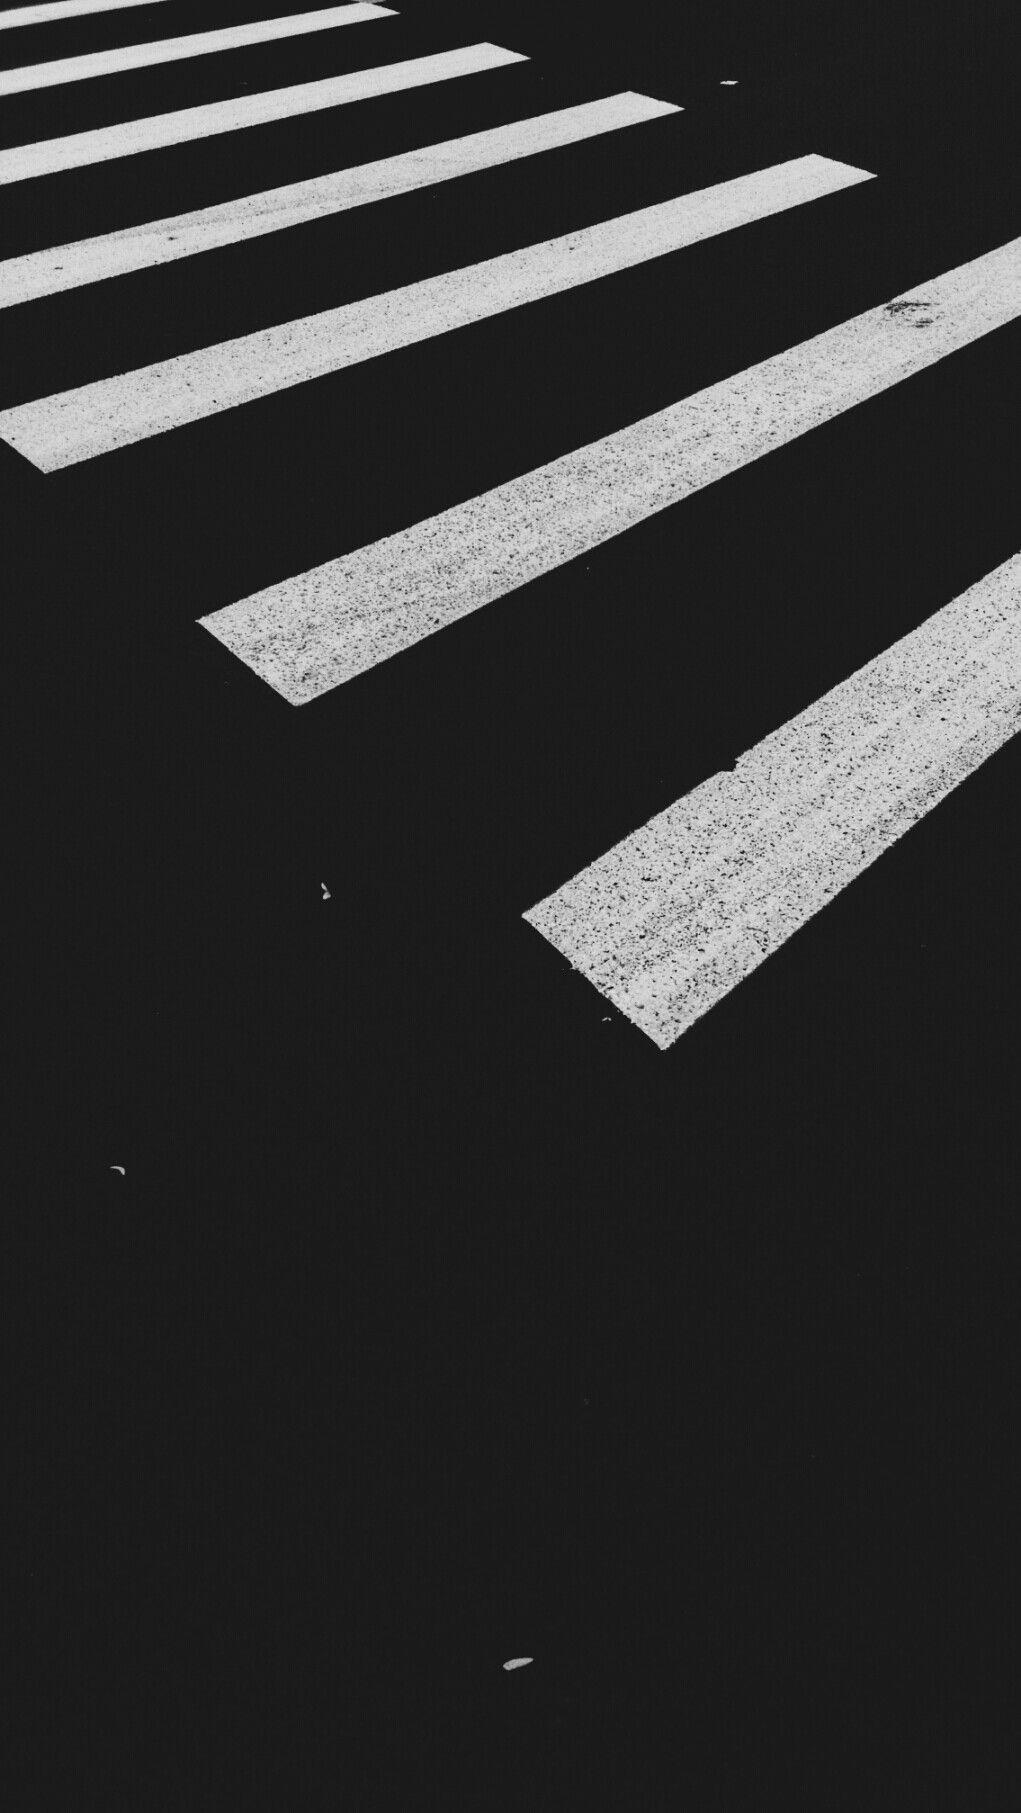 List of Most Downloaded Black Wallpaper for Smartphones 2019